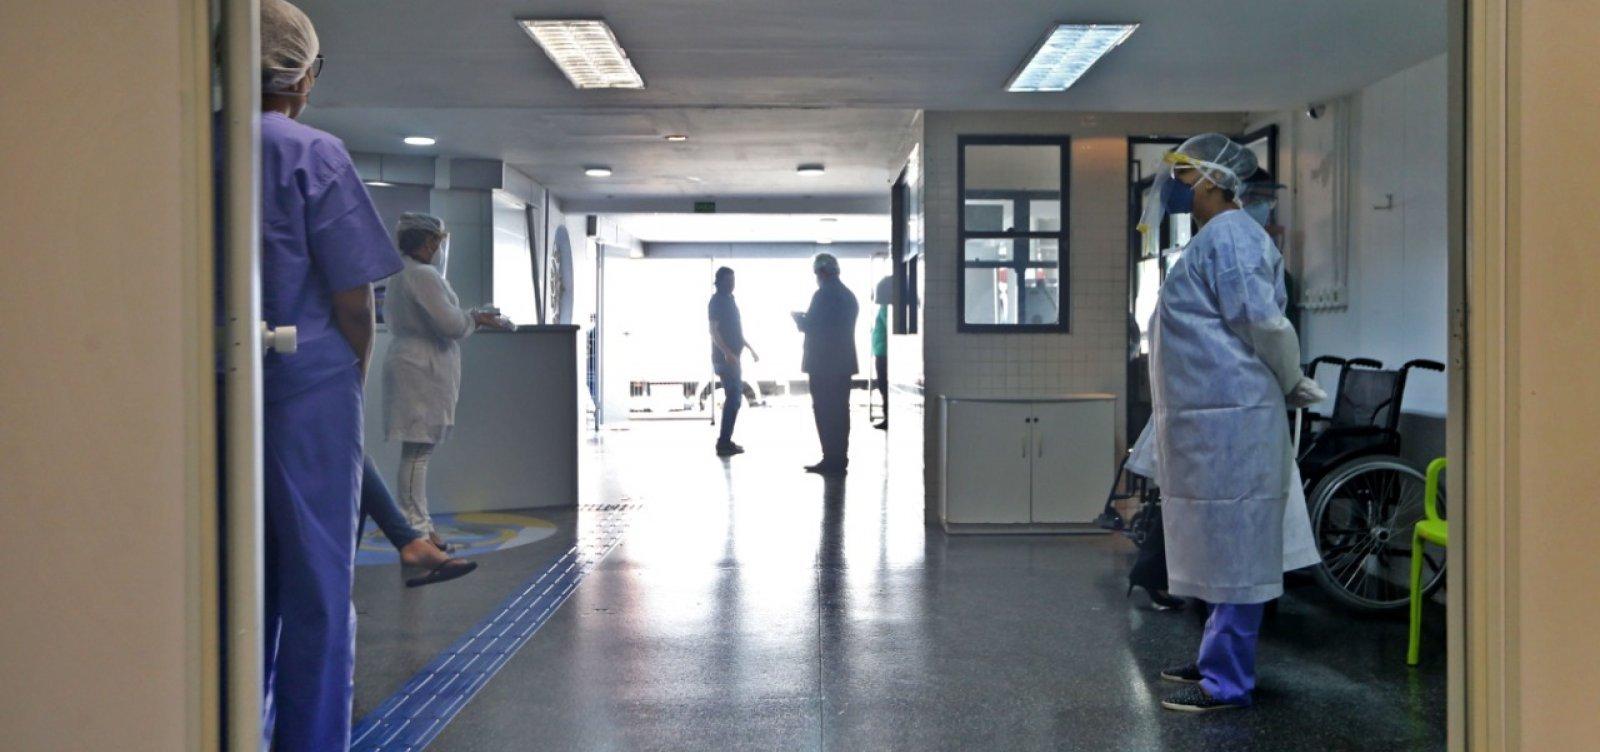 [Brasil tem 72.234 mortes por Covid-19, diz consórcio de imprensa]